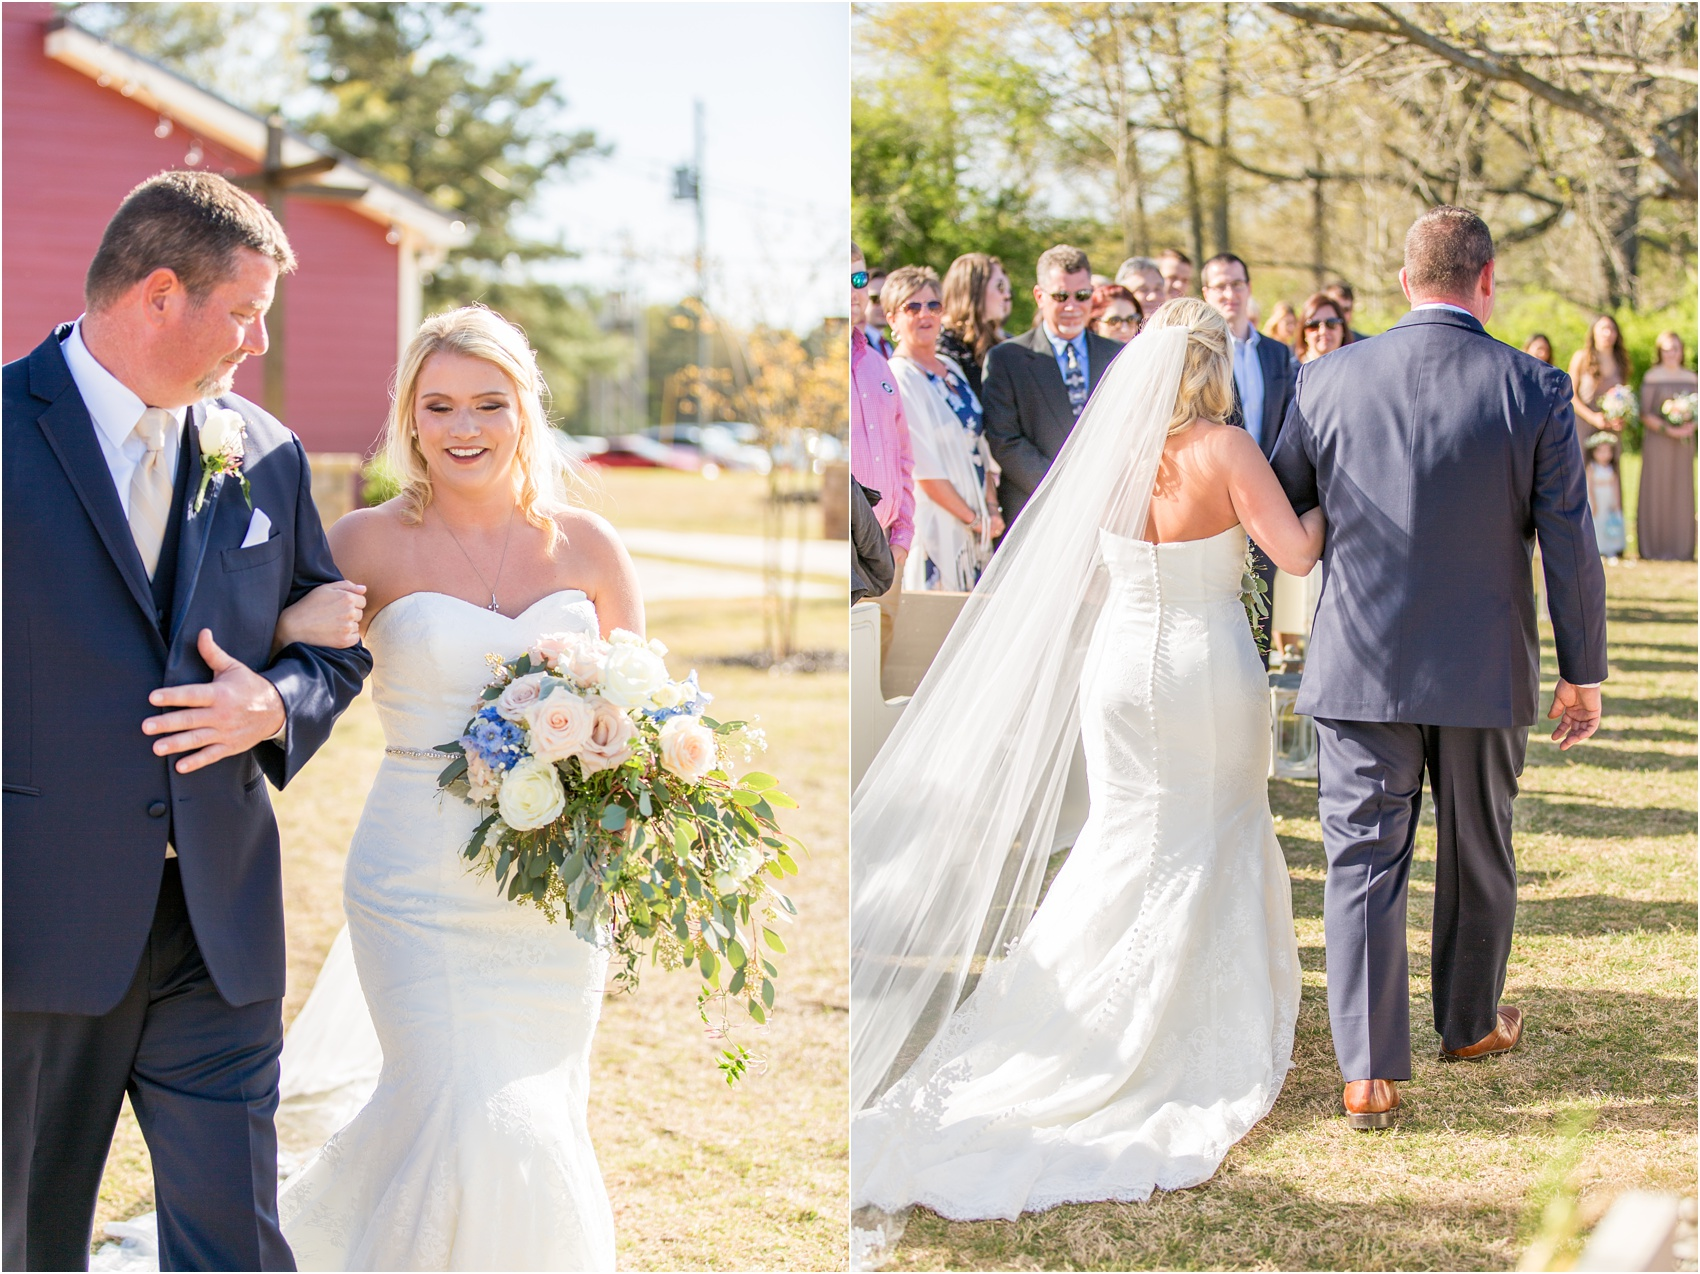 Savannah Eve Photography- Wade Wedding-48.jpg